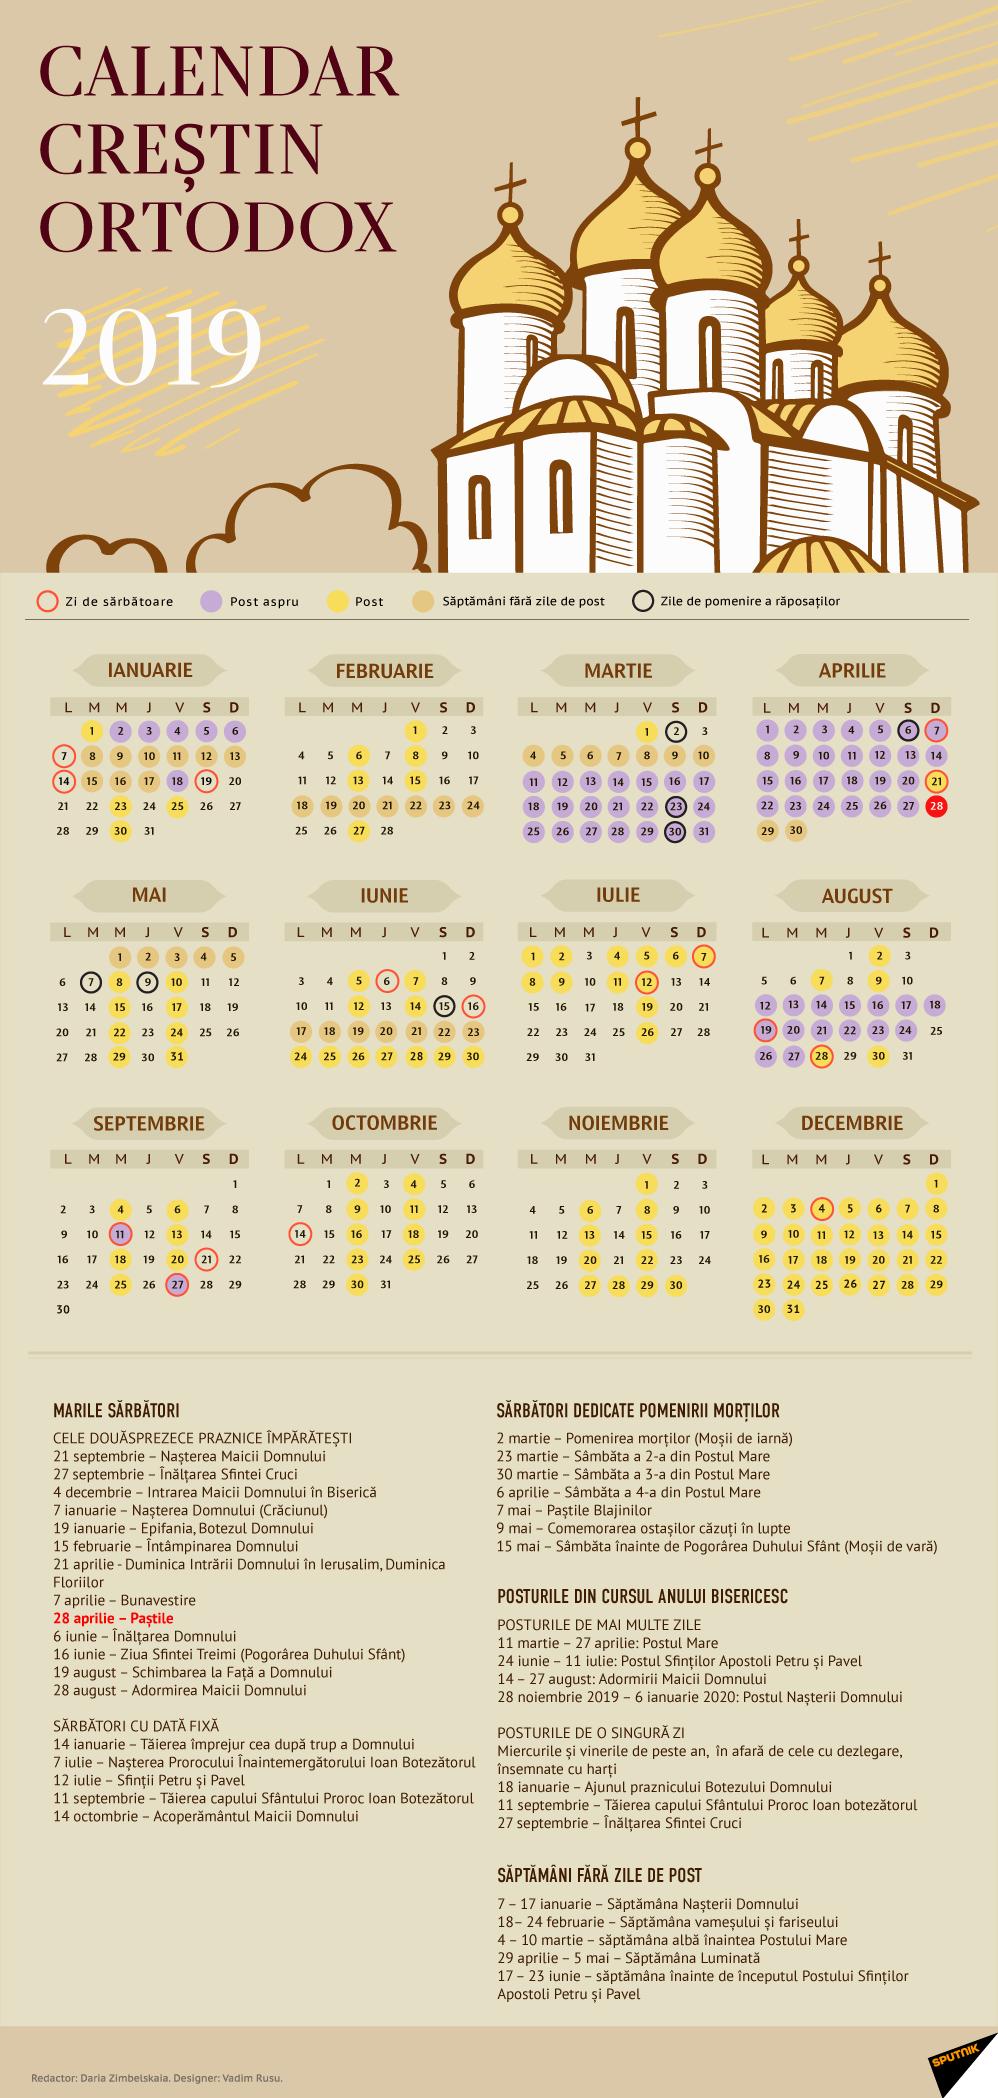 Calendar Creștin Ortodox 2019 - Stil Vechi Calendar 2019 Ortodox